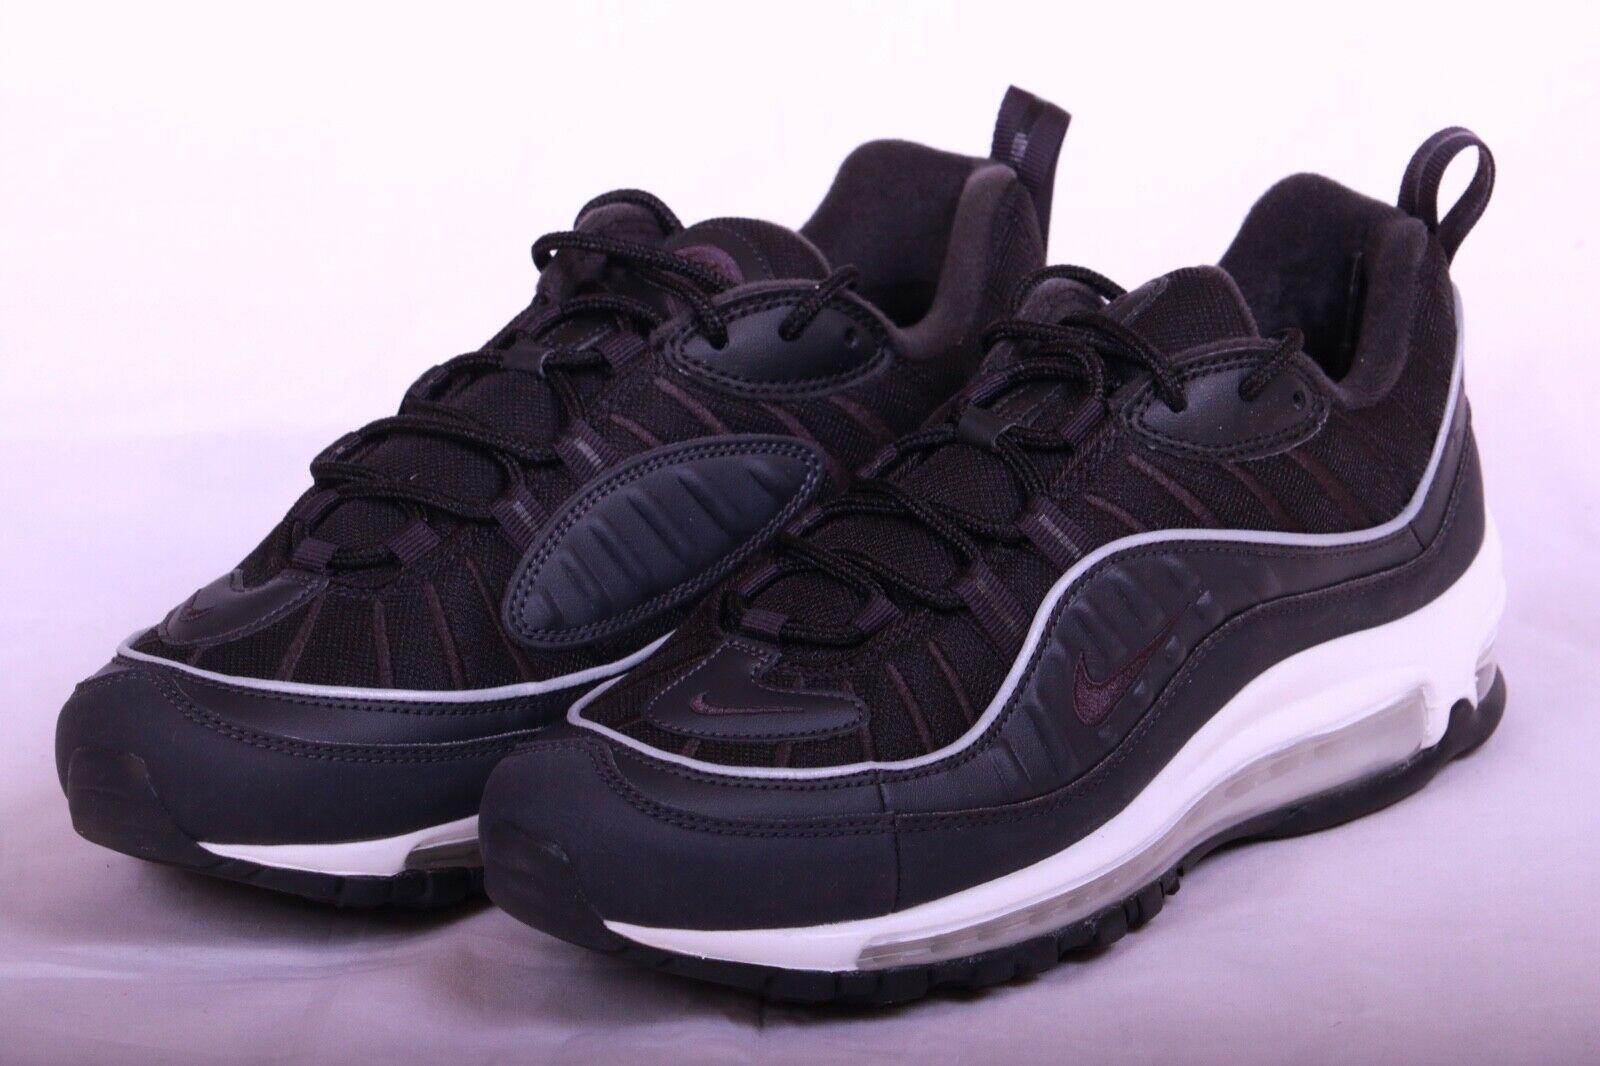 Nike Air Max 98 Men's New Oil Grey Black Casual Sneakers 640744 009 Size 8-11